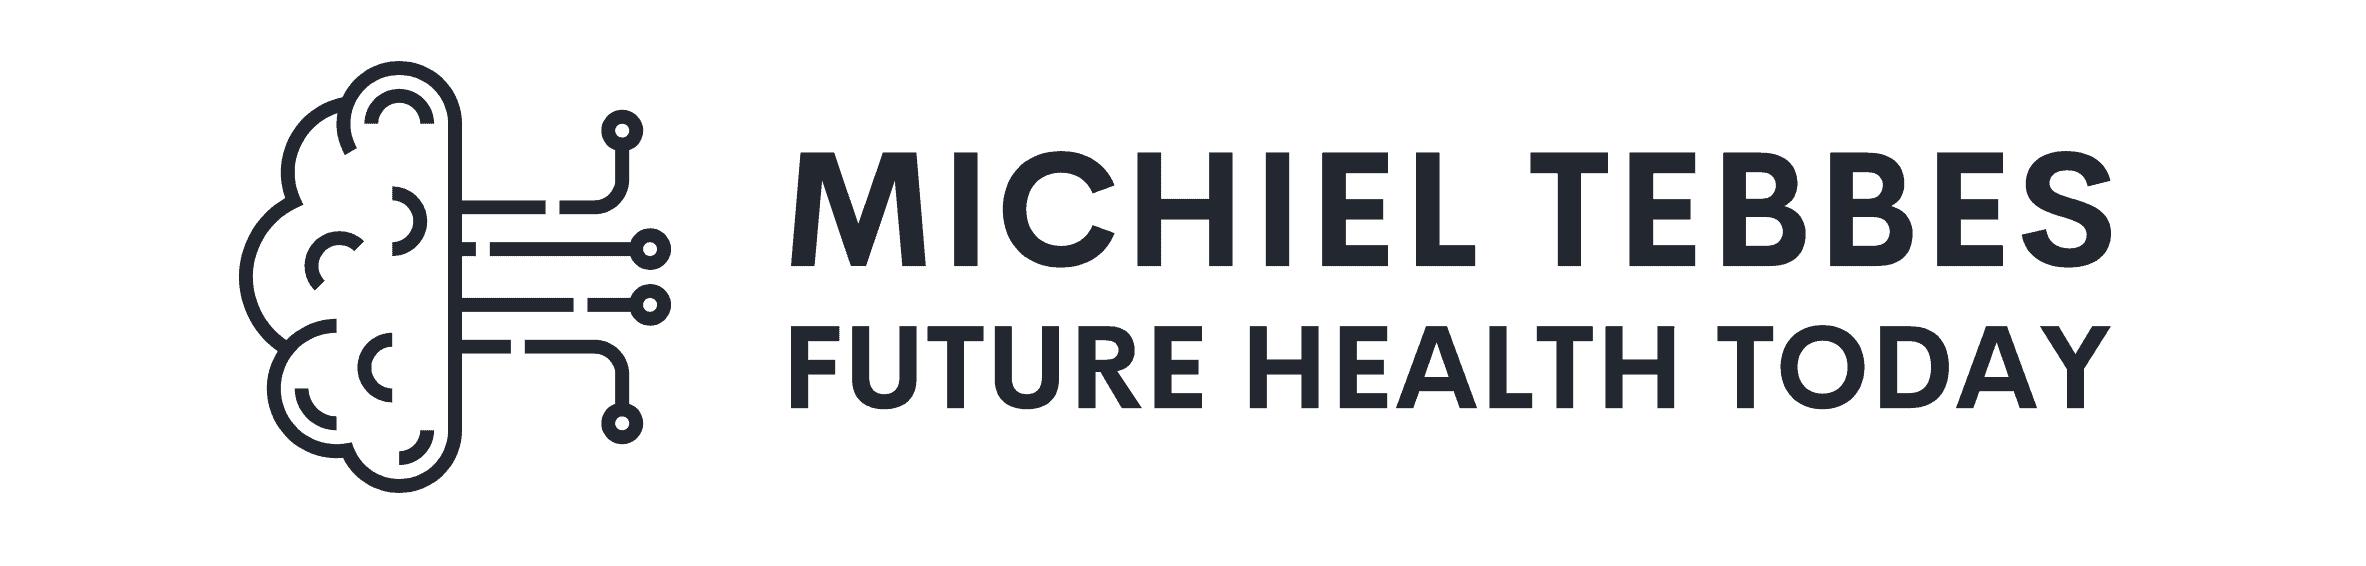 Michiel Tebbes - Medisch Futuroloog